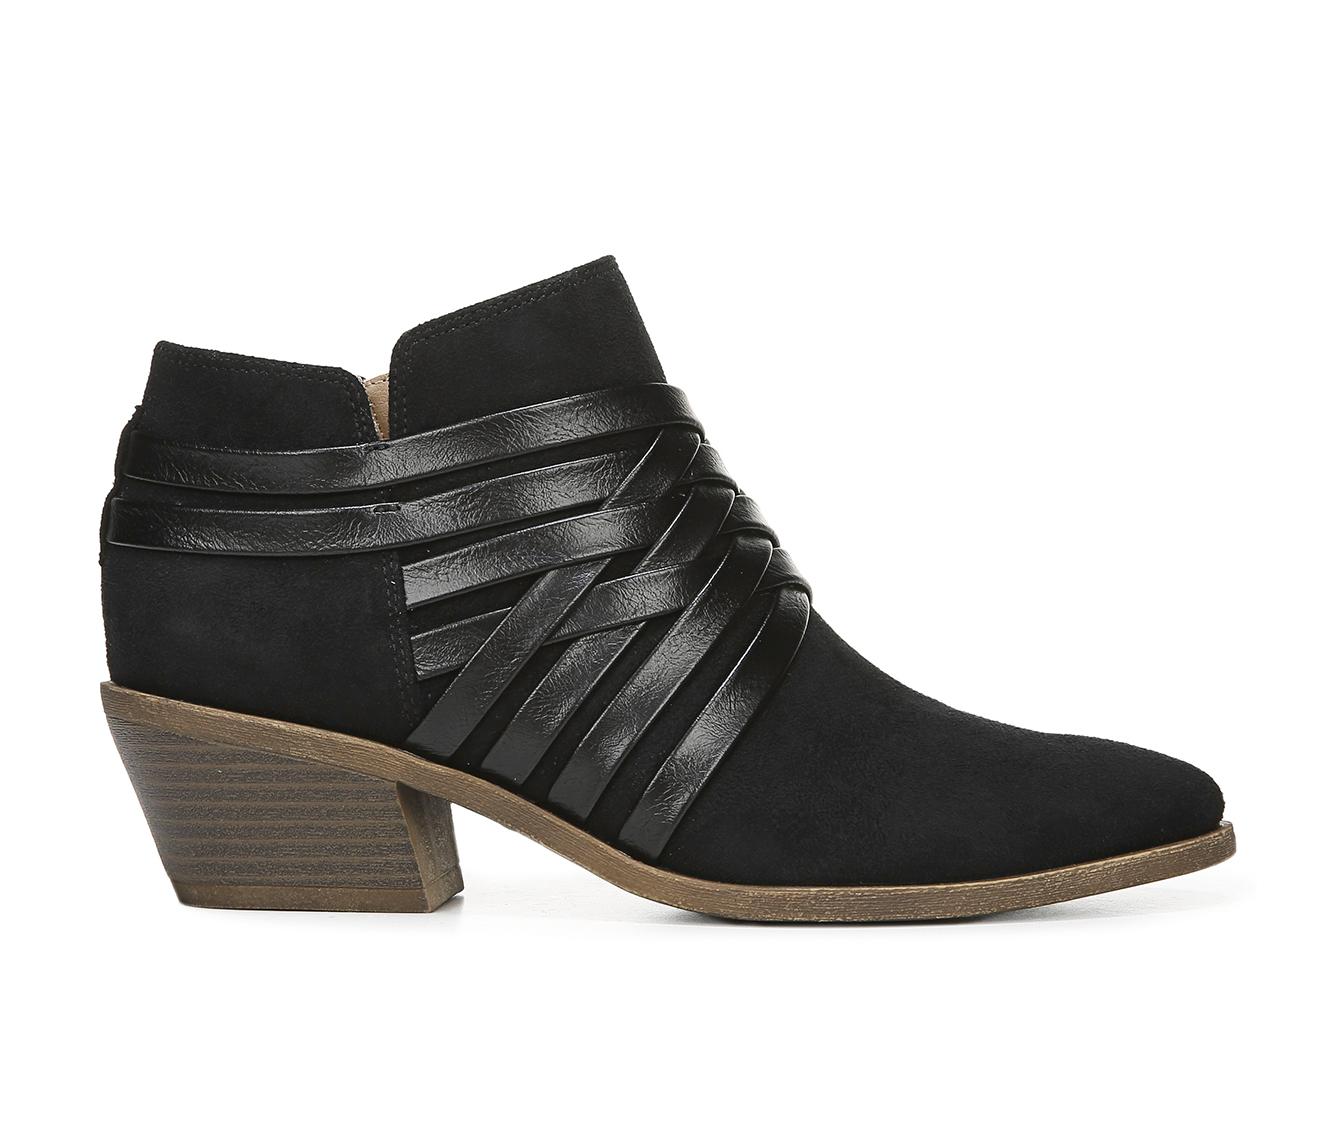 LifeStride Prairie Women's Boots (Black - Faux Leather)